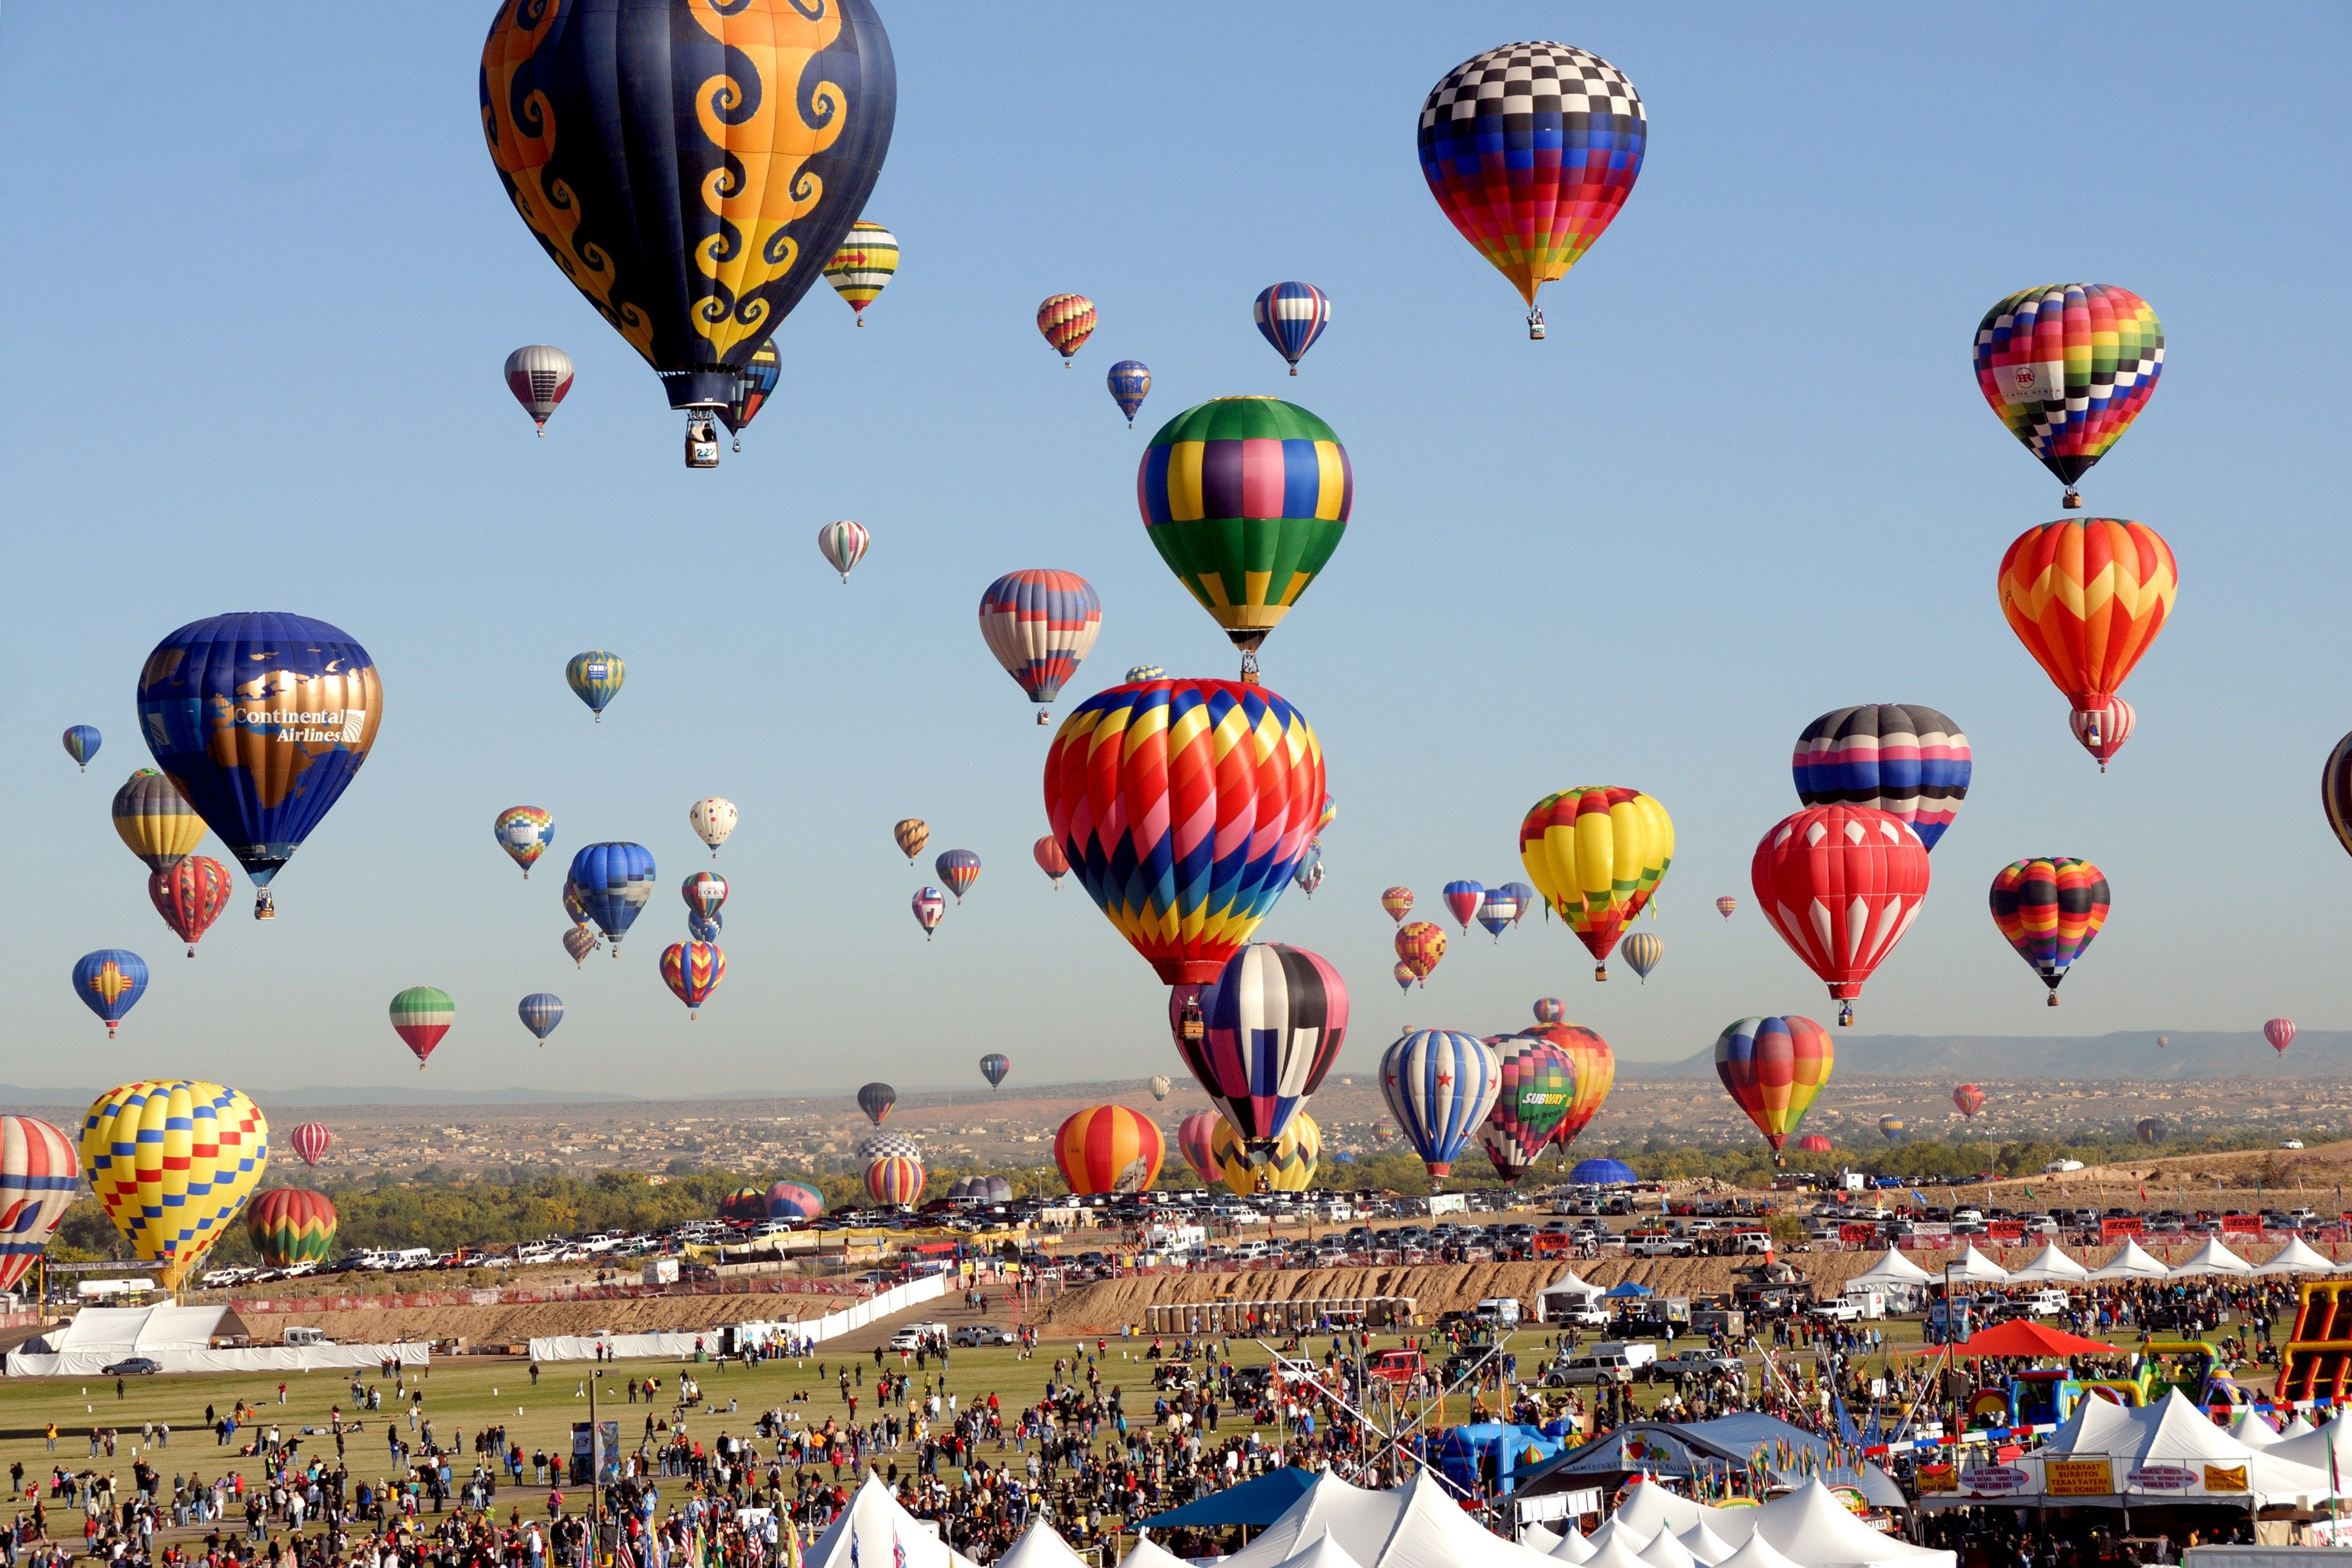 Albuquerque International Balloon Fiesta Our Traveling